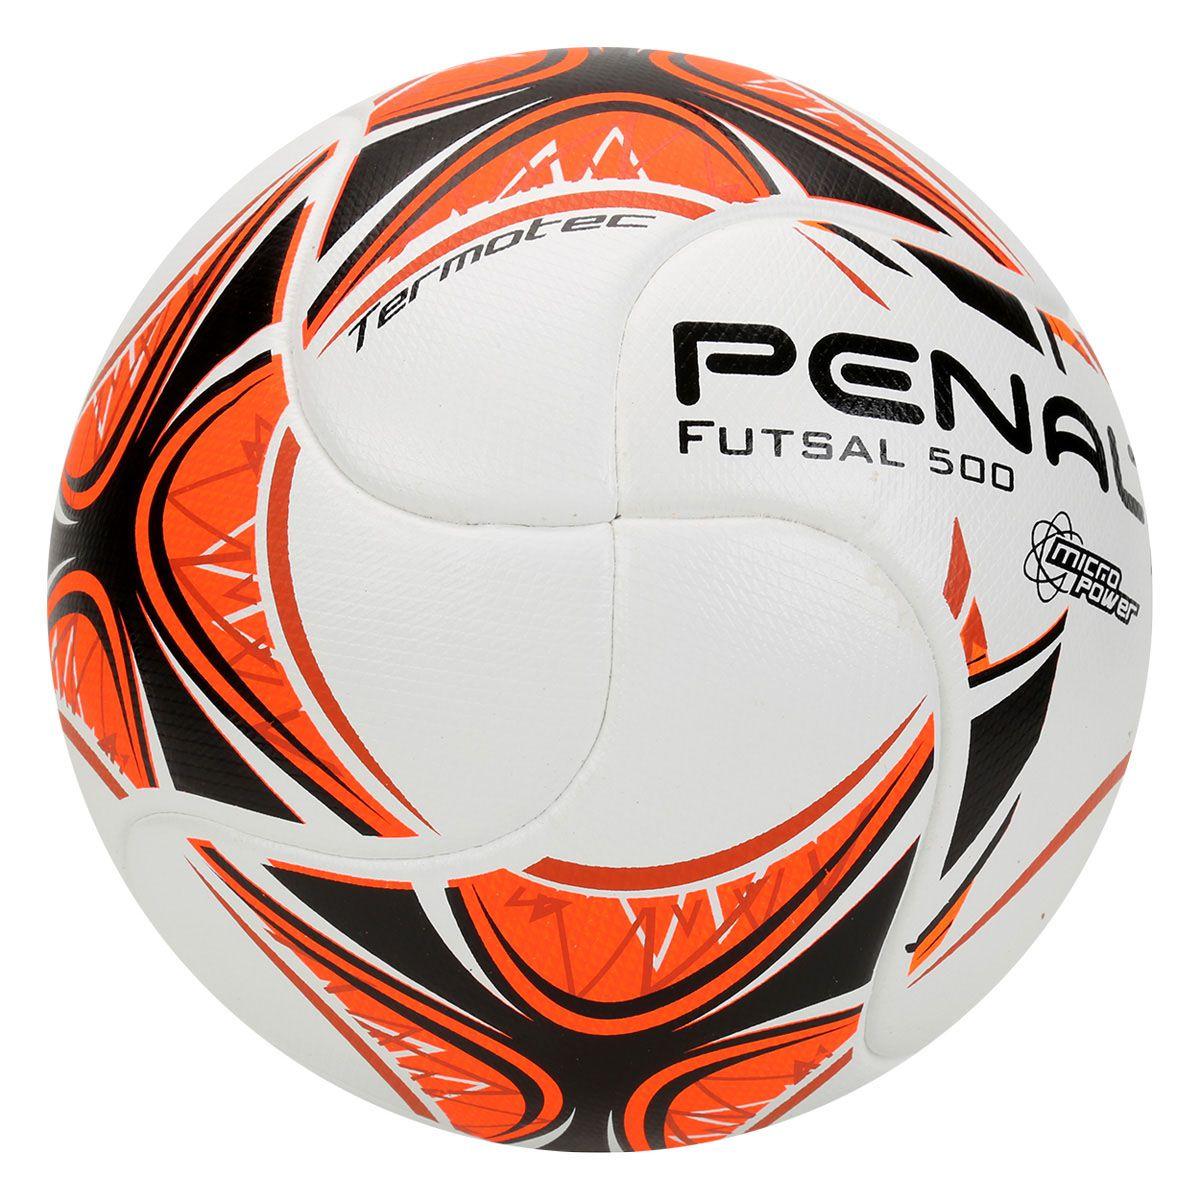 Bola Penalty Futsal Matis 500 Termotec 7 9571596744683